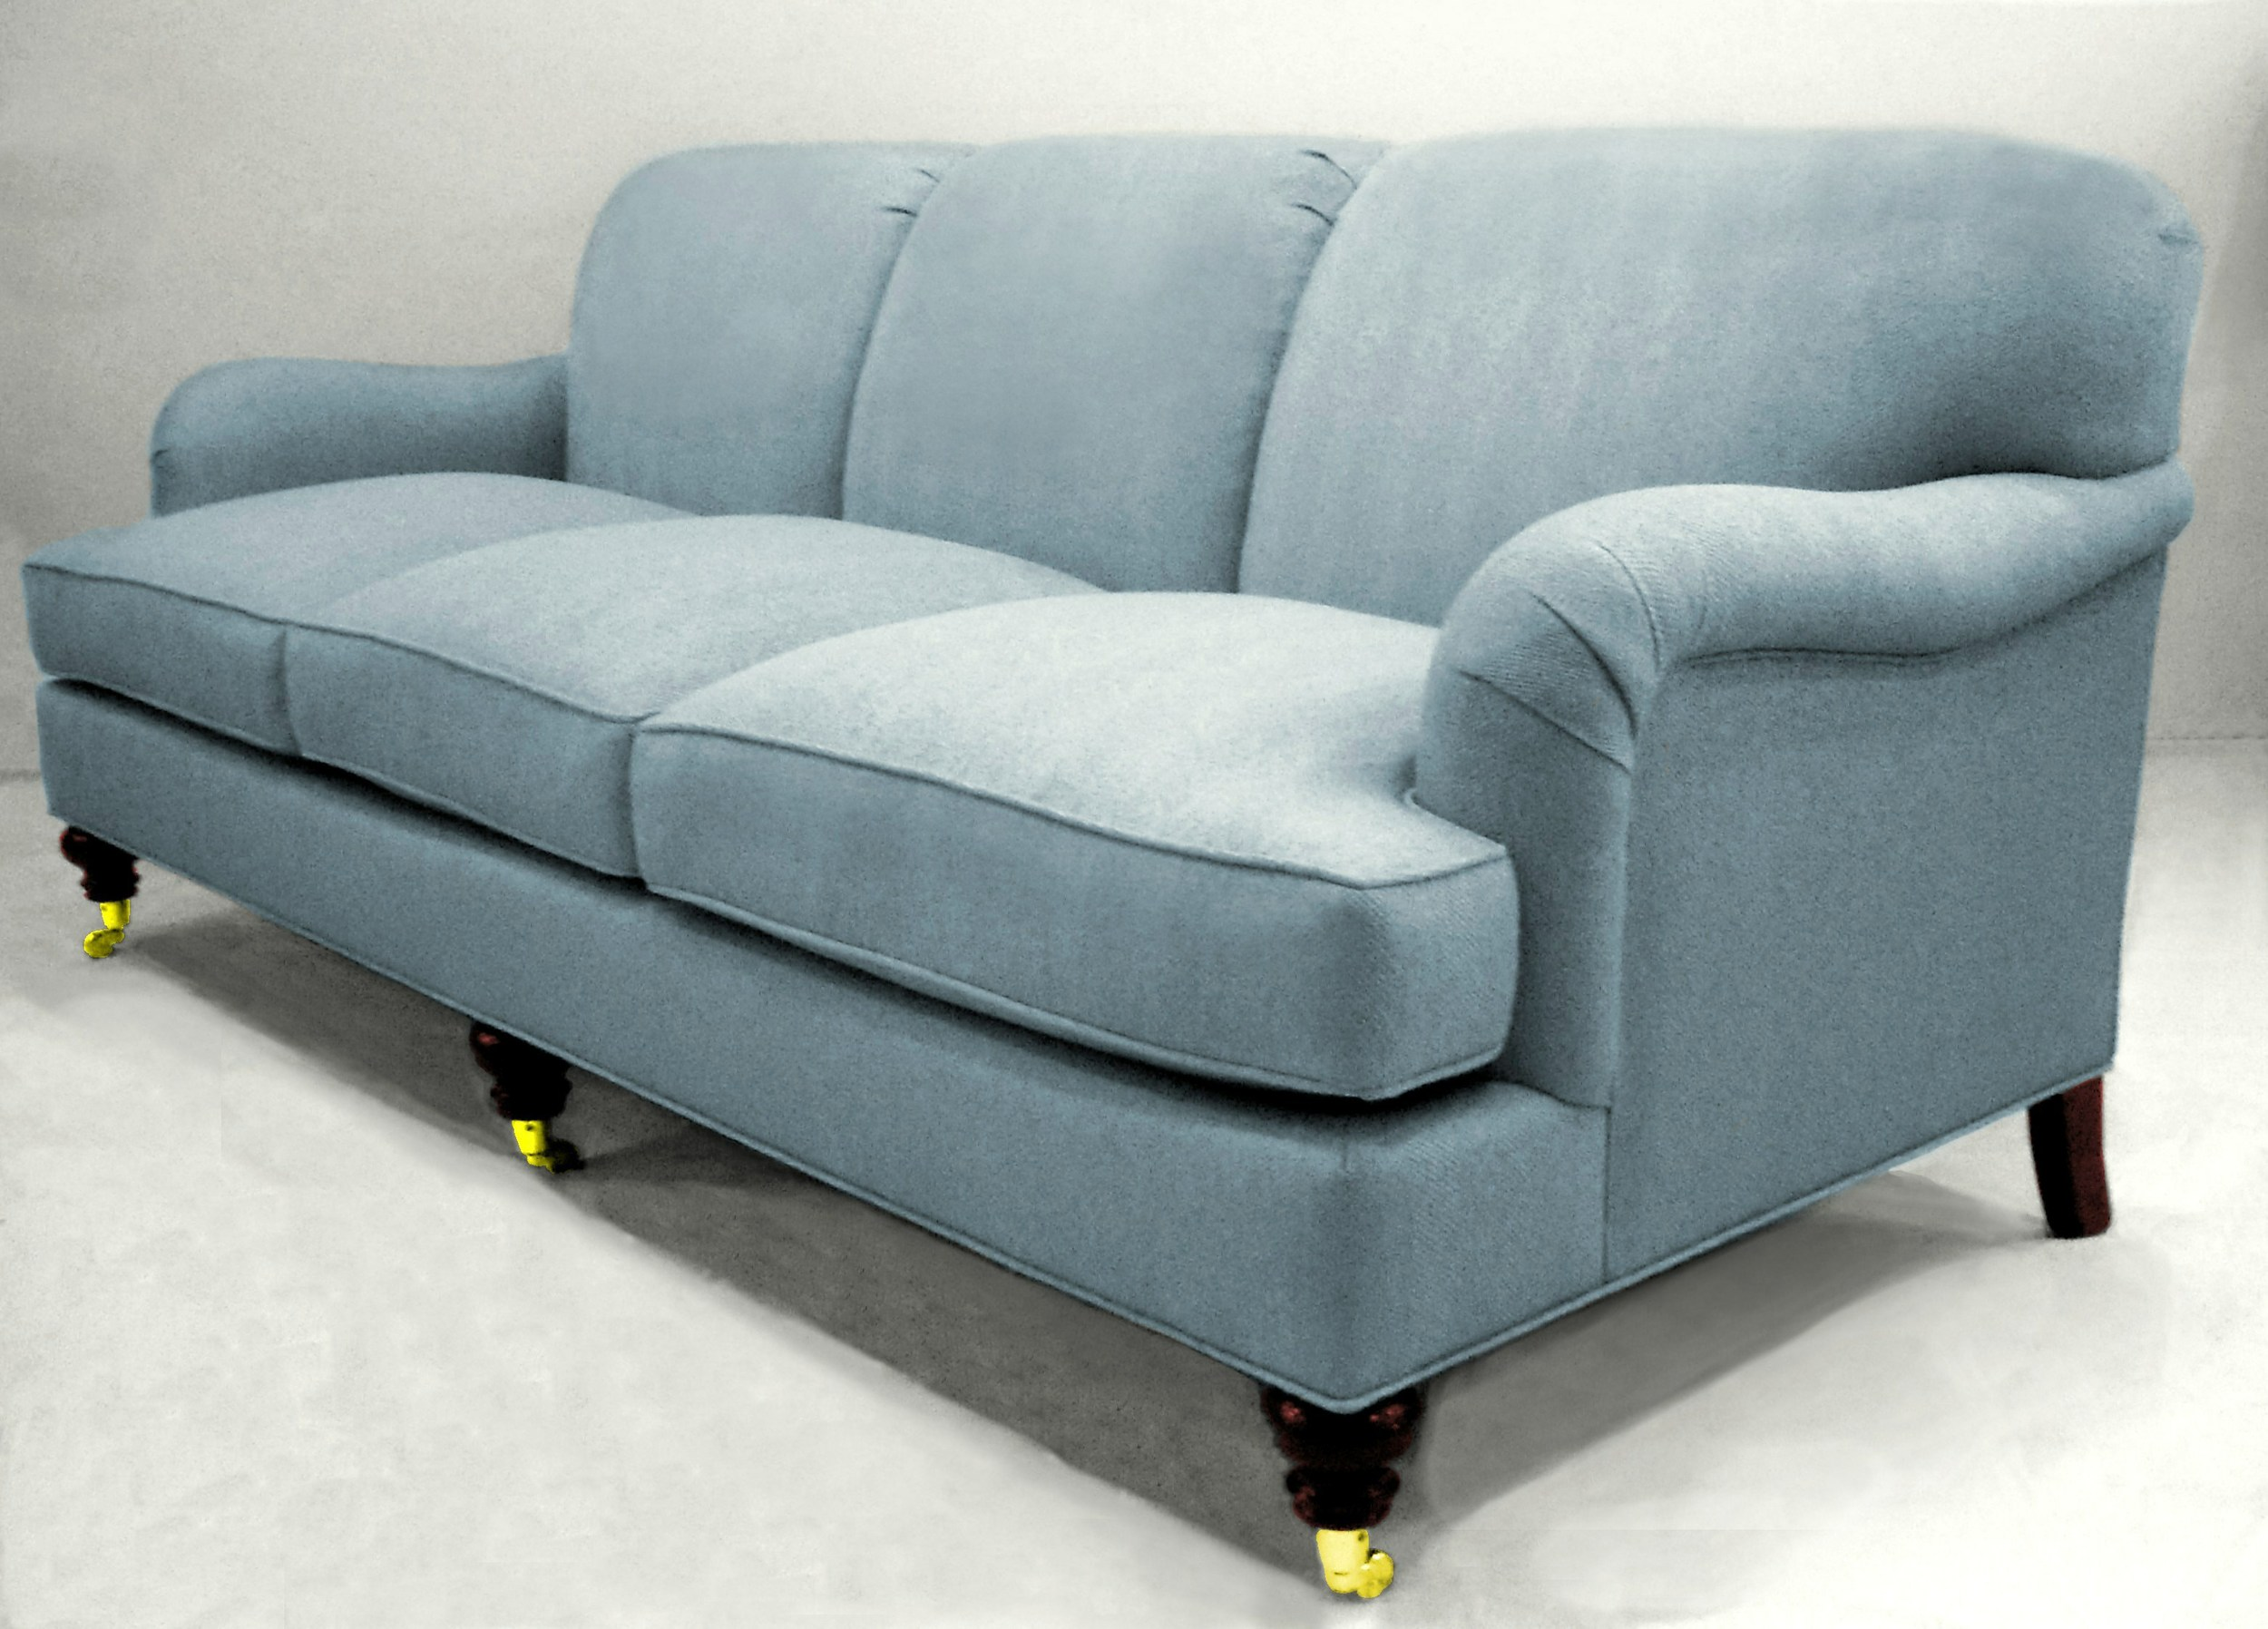 201 sofa w/casters